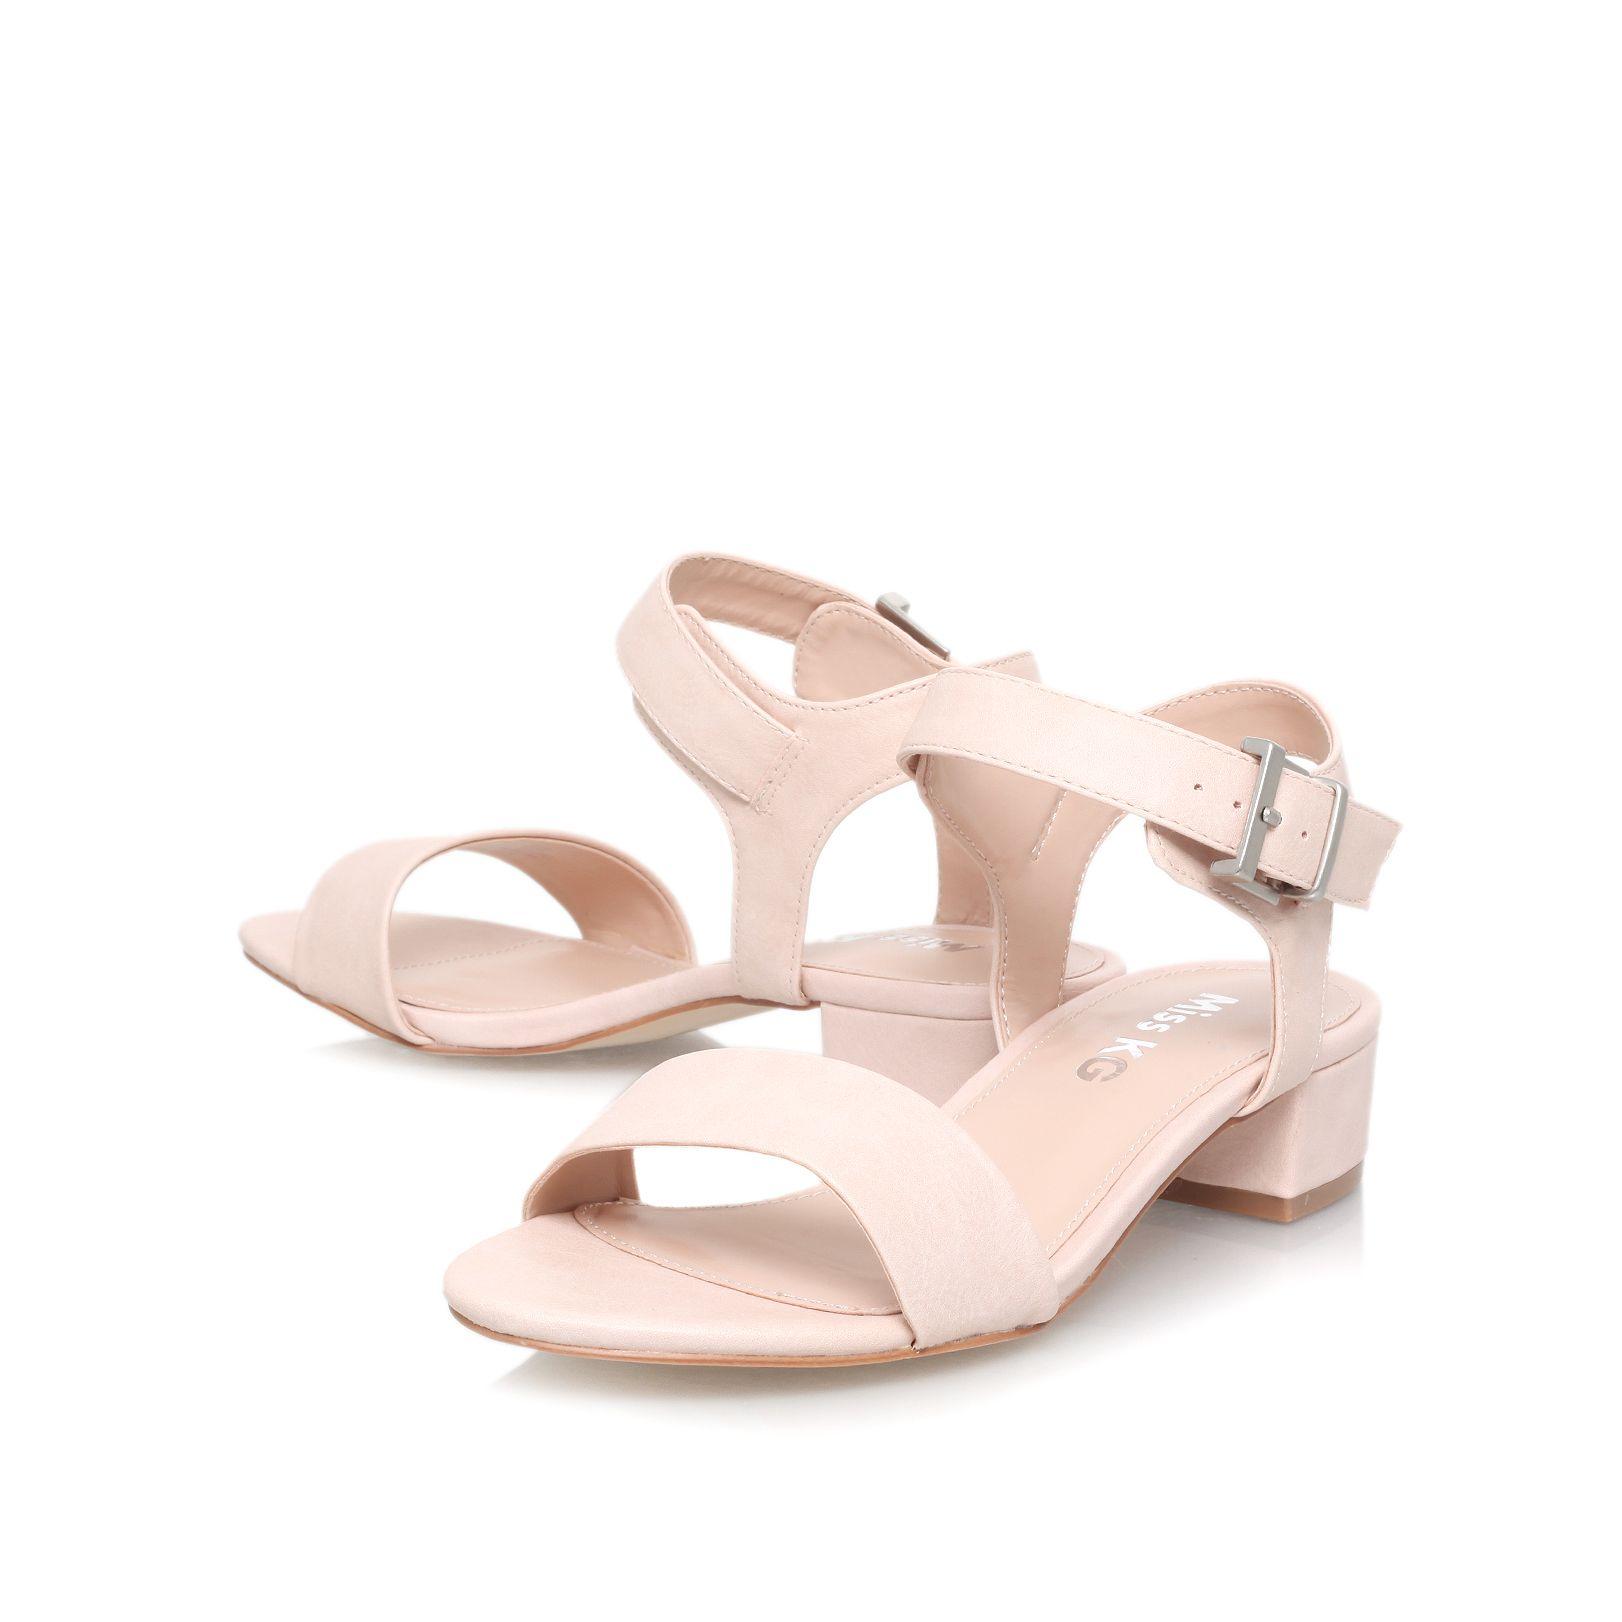 Miss kg Pamela Low Heel Sandals in Natural | Lyst